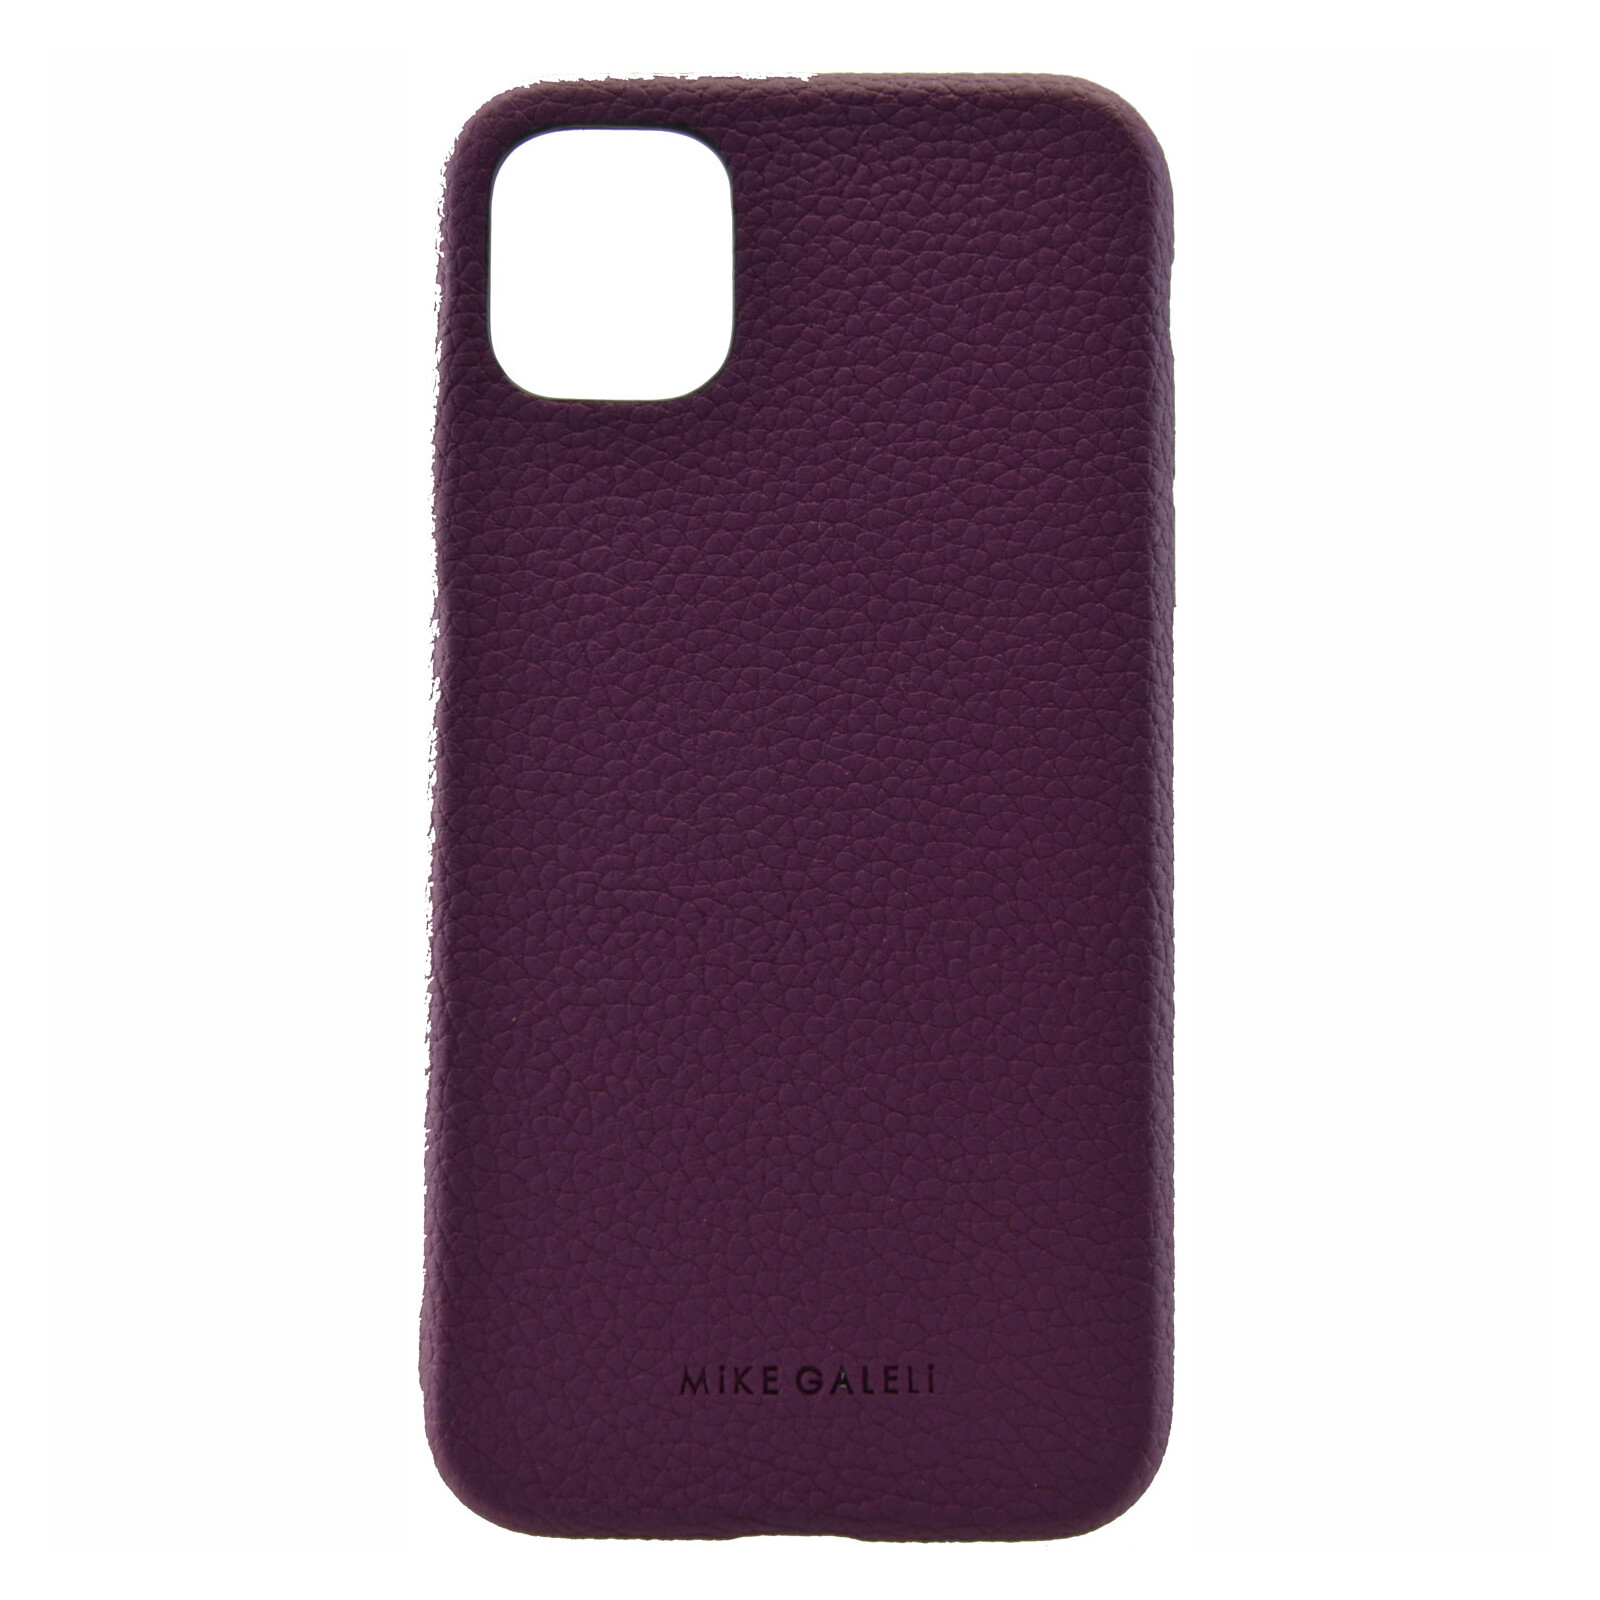 Galeli Backcover FINN Apple iPhone 12  Max/ Pro viola